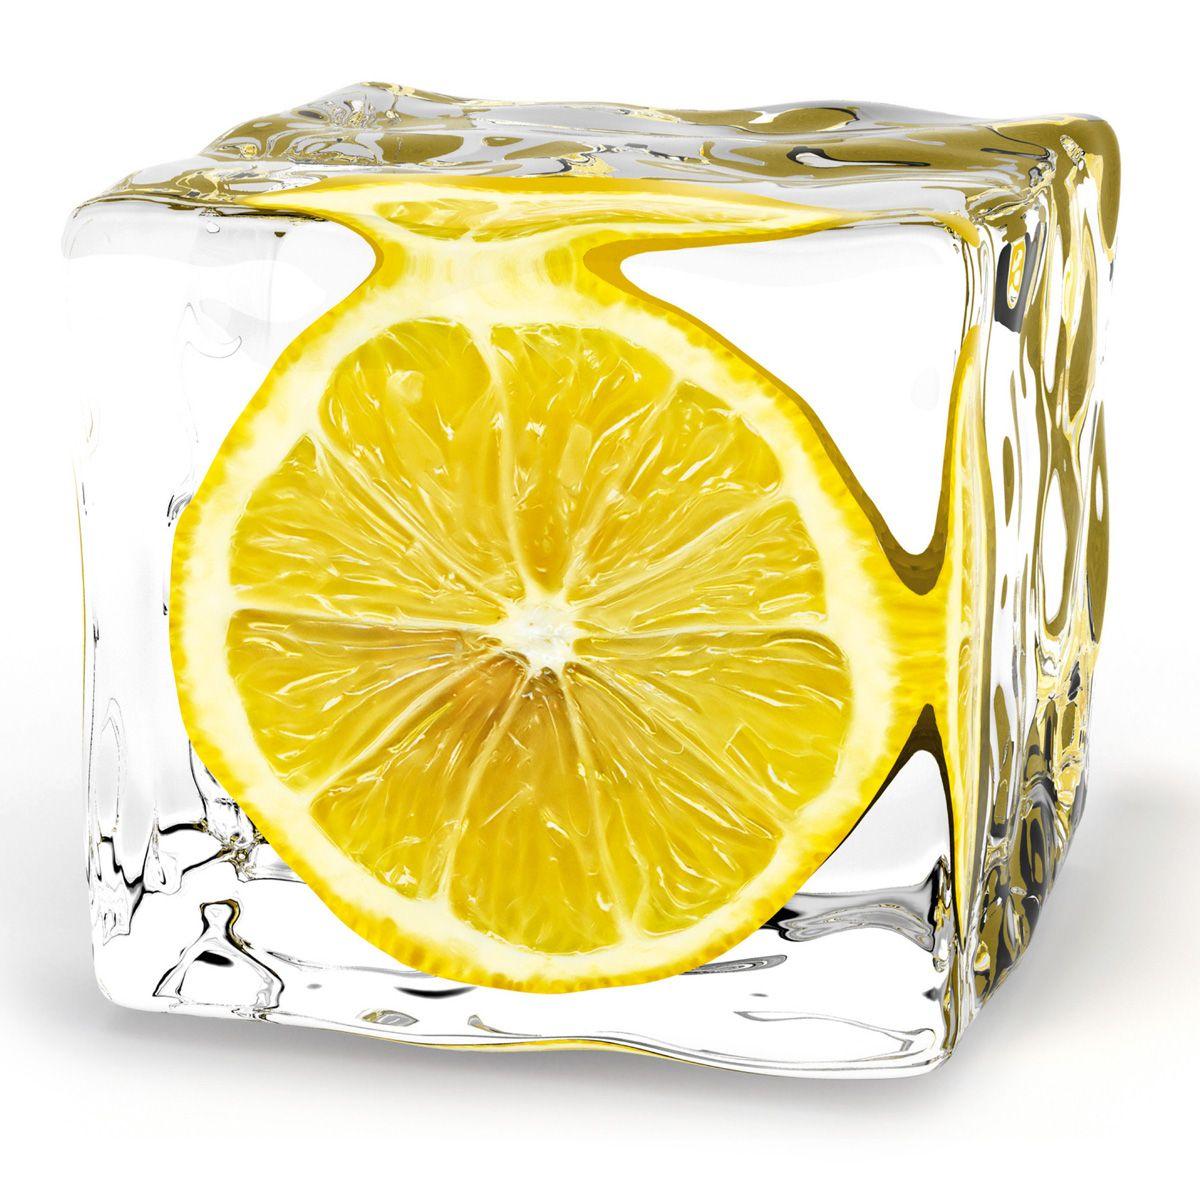 Deco Glass Wall Decor - Iced Lemon $59.99 | Platin Art\'s Wall ...